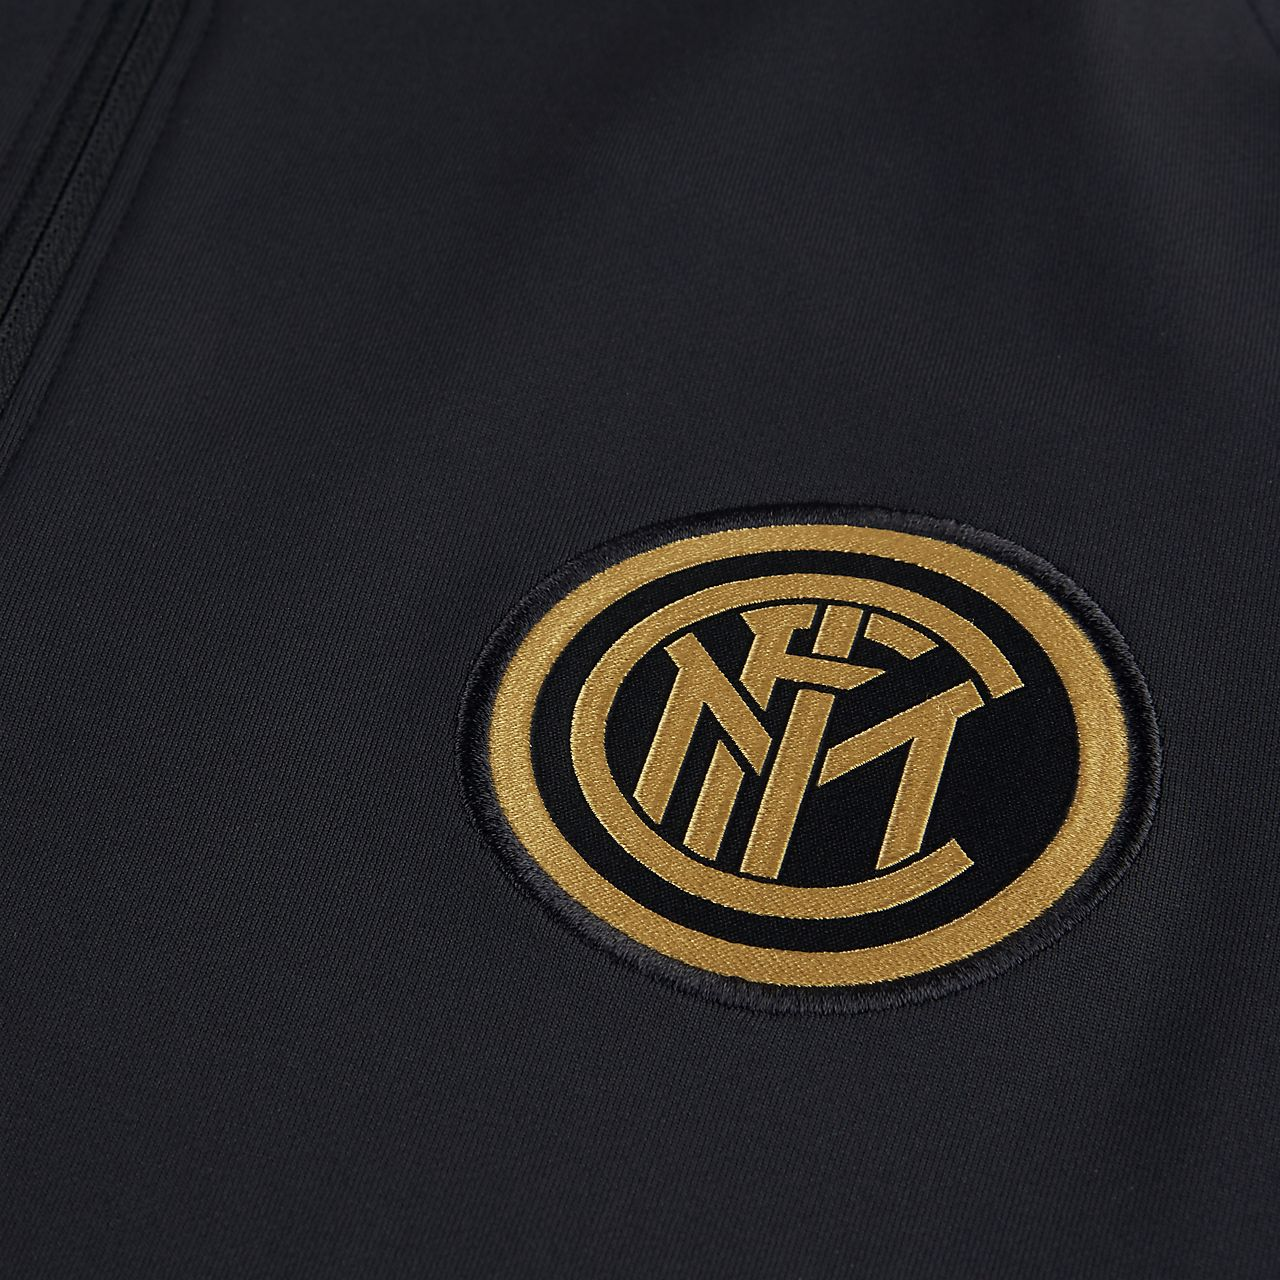 fdcfca77d2 Nike Dri-FIT Inter Milan Strike Men's Football Drill Top